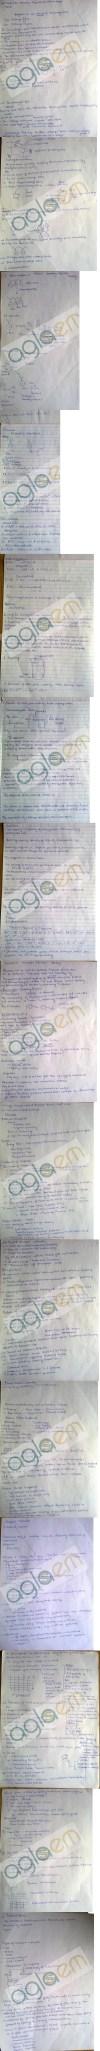 DTU: Notes - 1 Sem AC - Ion Exchange Resins